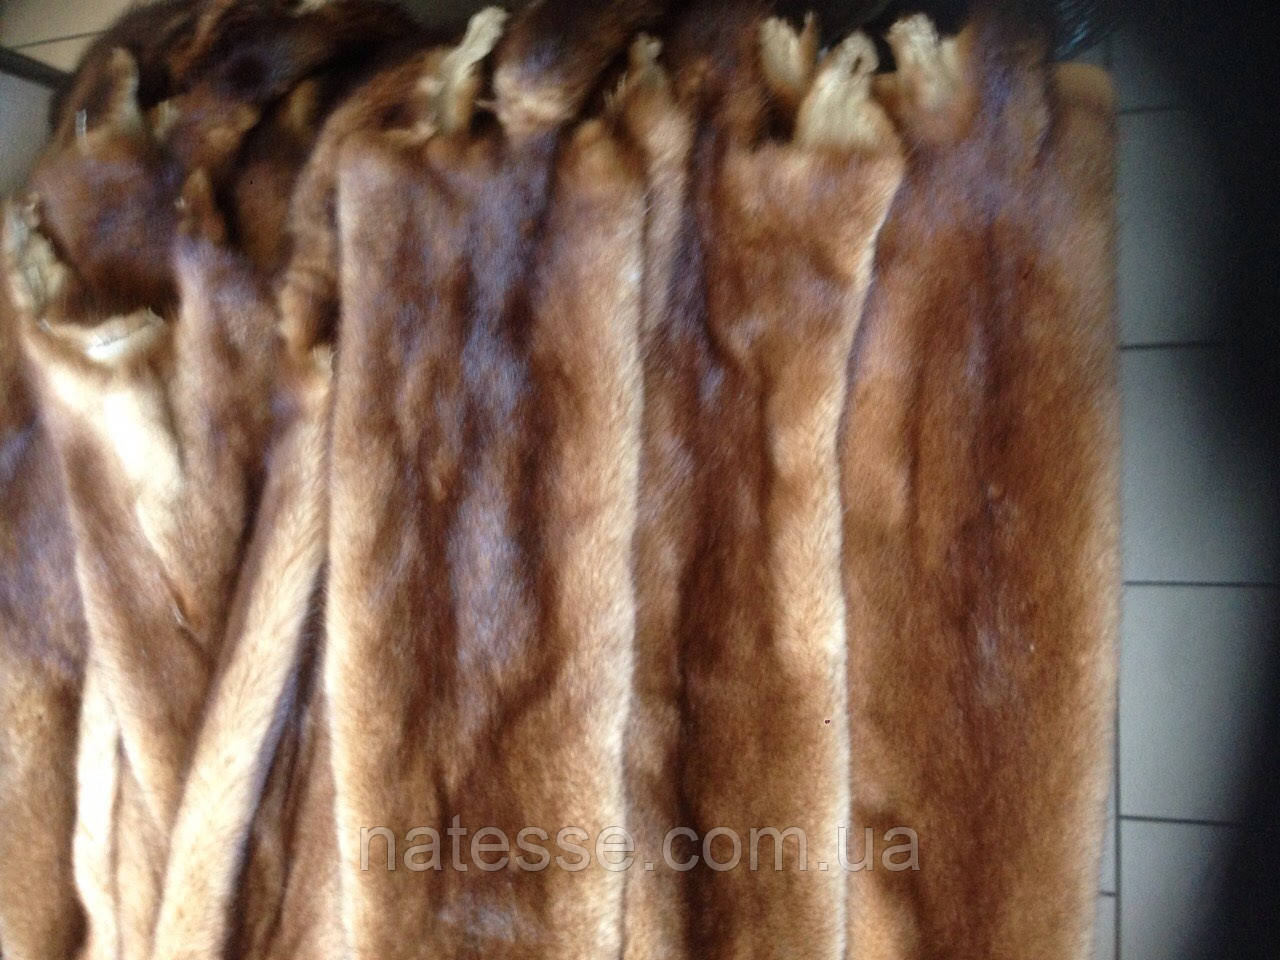 Шкуры мех норка цвета золото датская, самцы 70-75 см